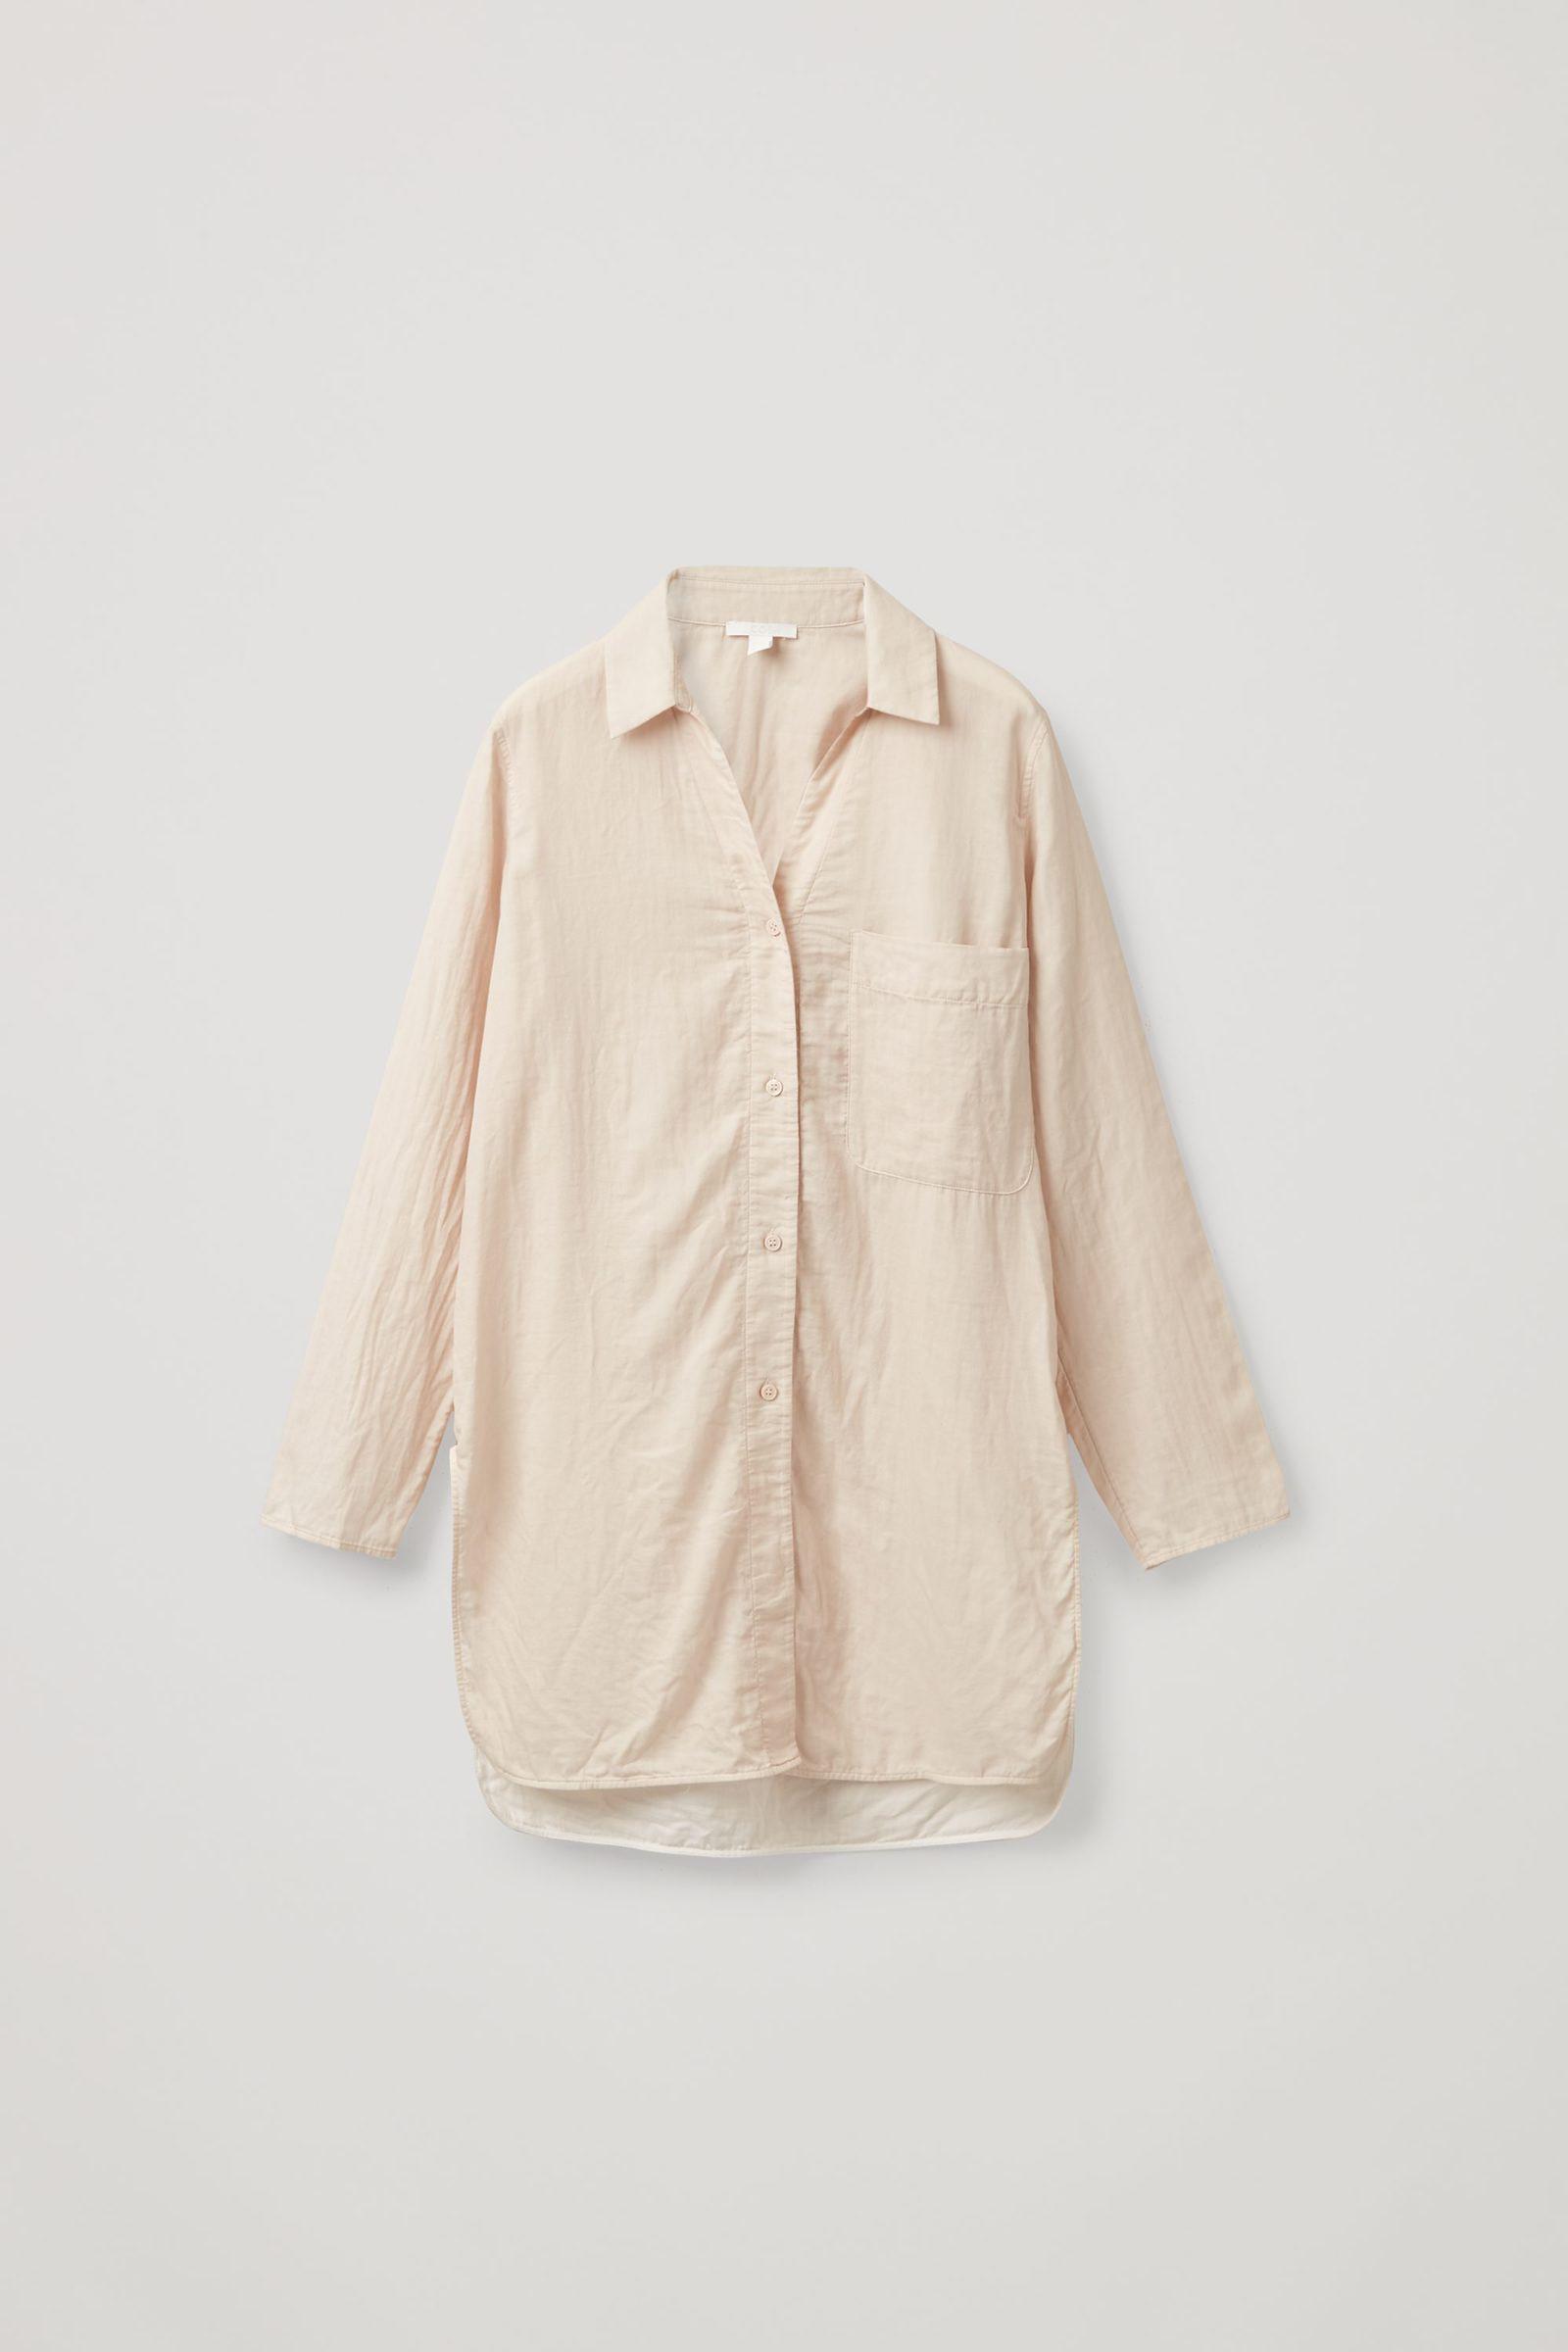 COS 오가닉 코튼 오버사이즈 튜닉 스타일 셔츠의 베이지컬러 Product입니다.